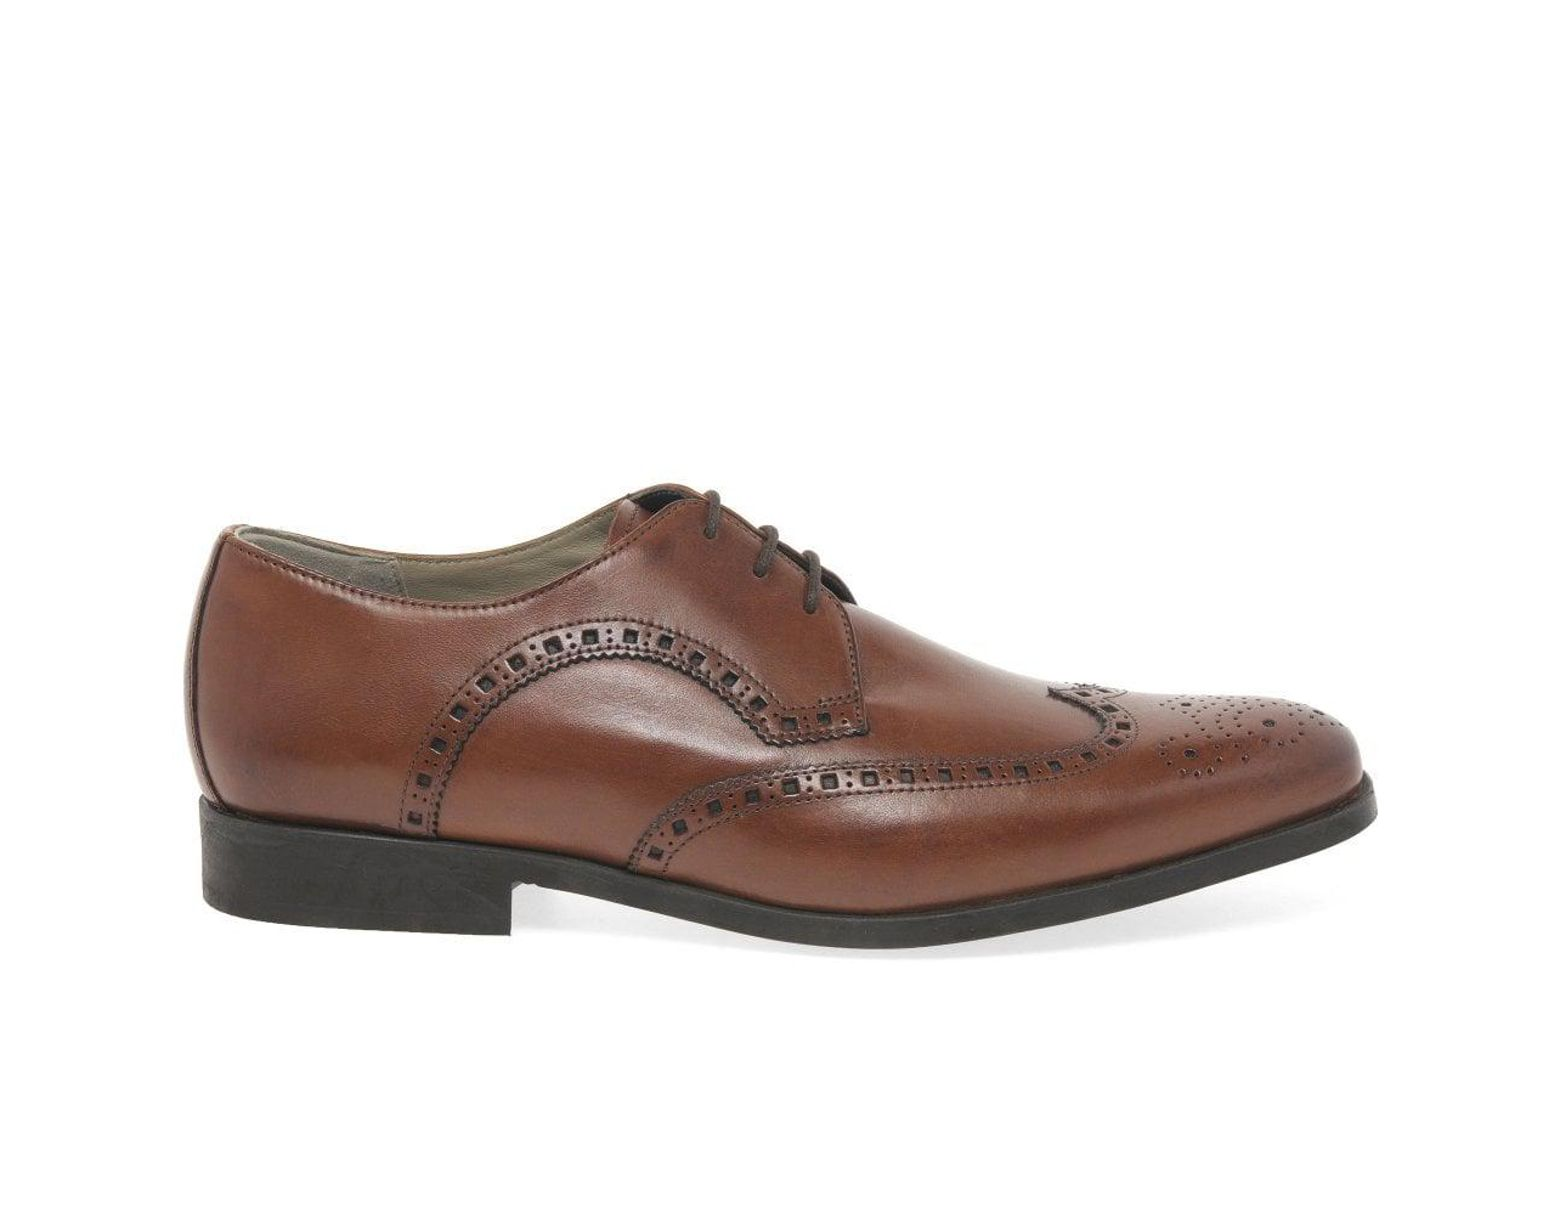 Clarks Amieson Oxfords Limit Clarks Chaussures Amieson Oxfords Limit LSUzGMpqV